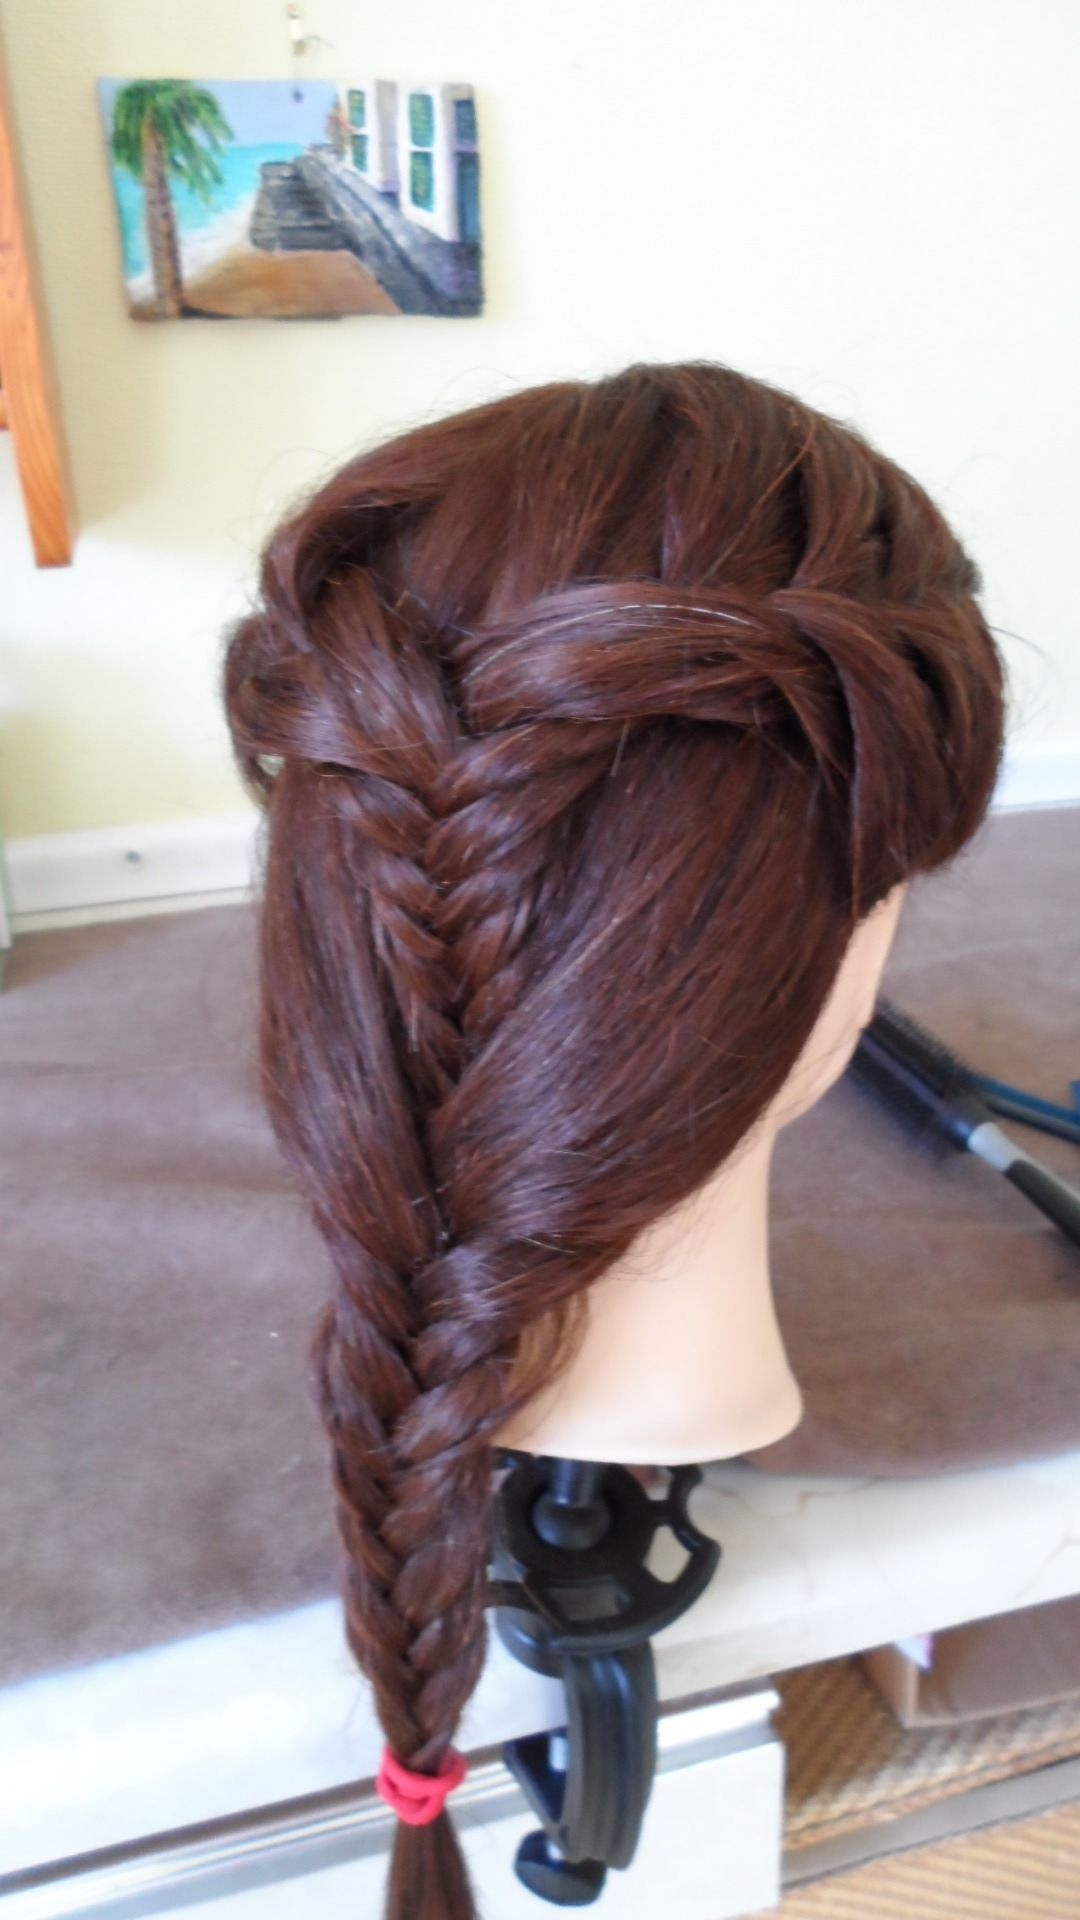 Sks ren hair fallout style